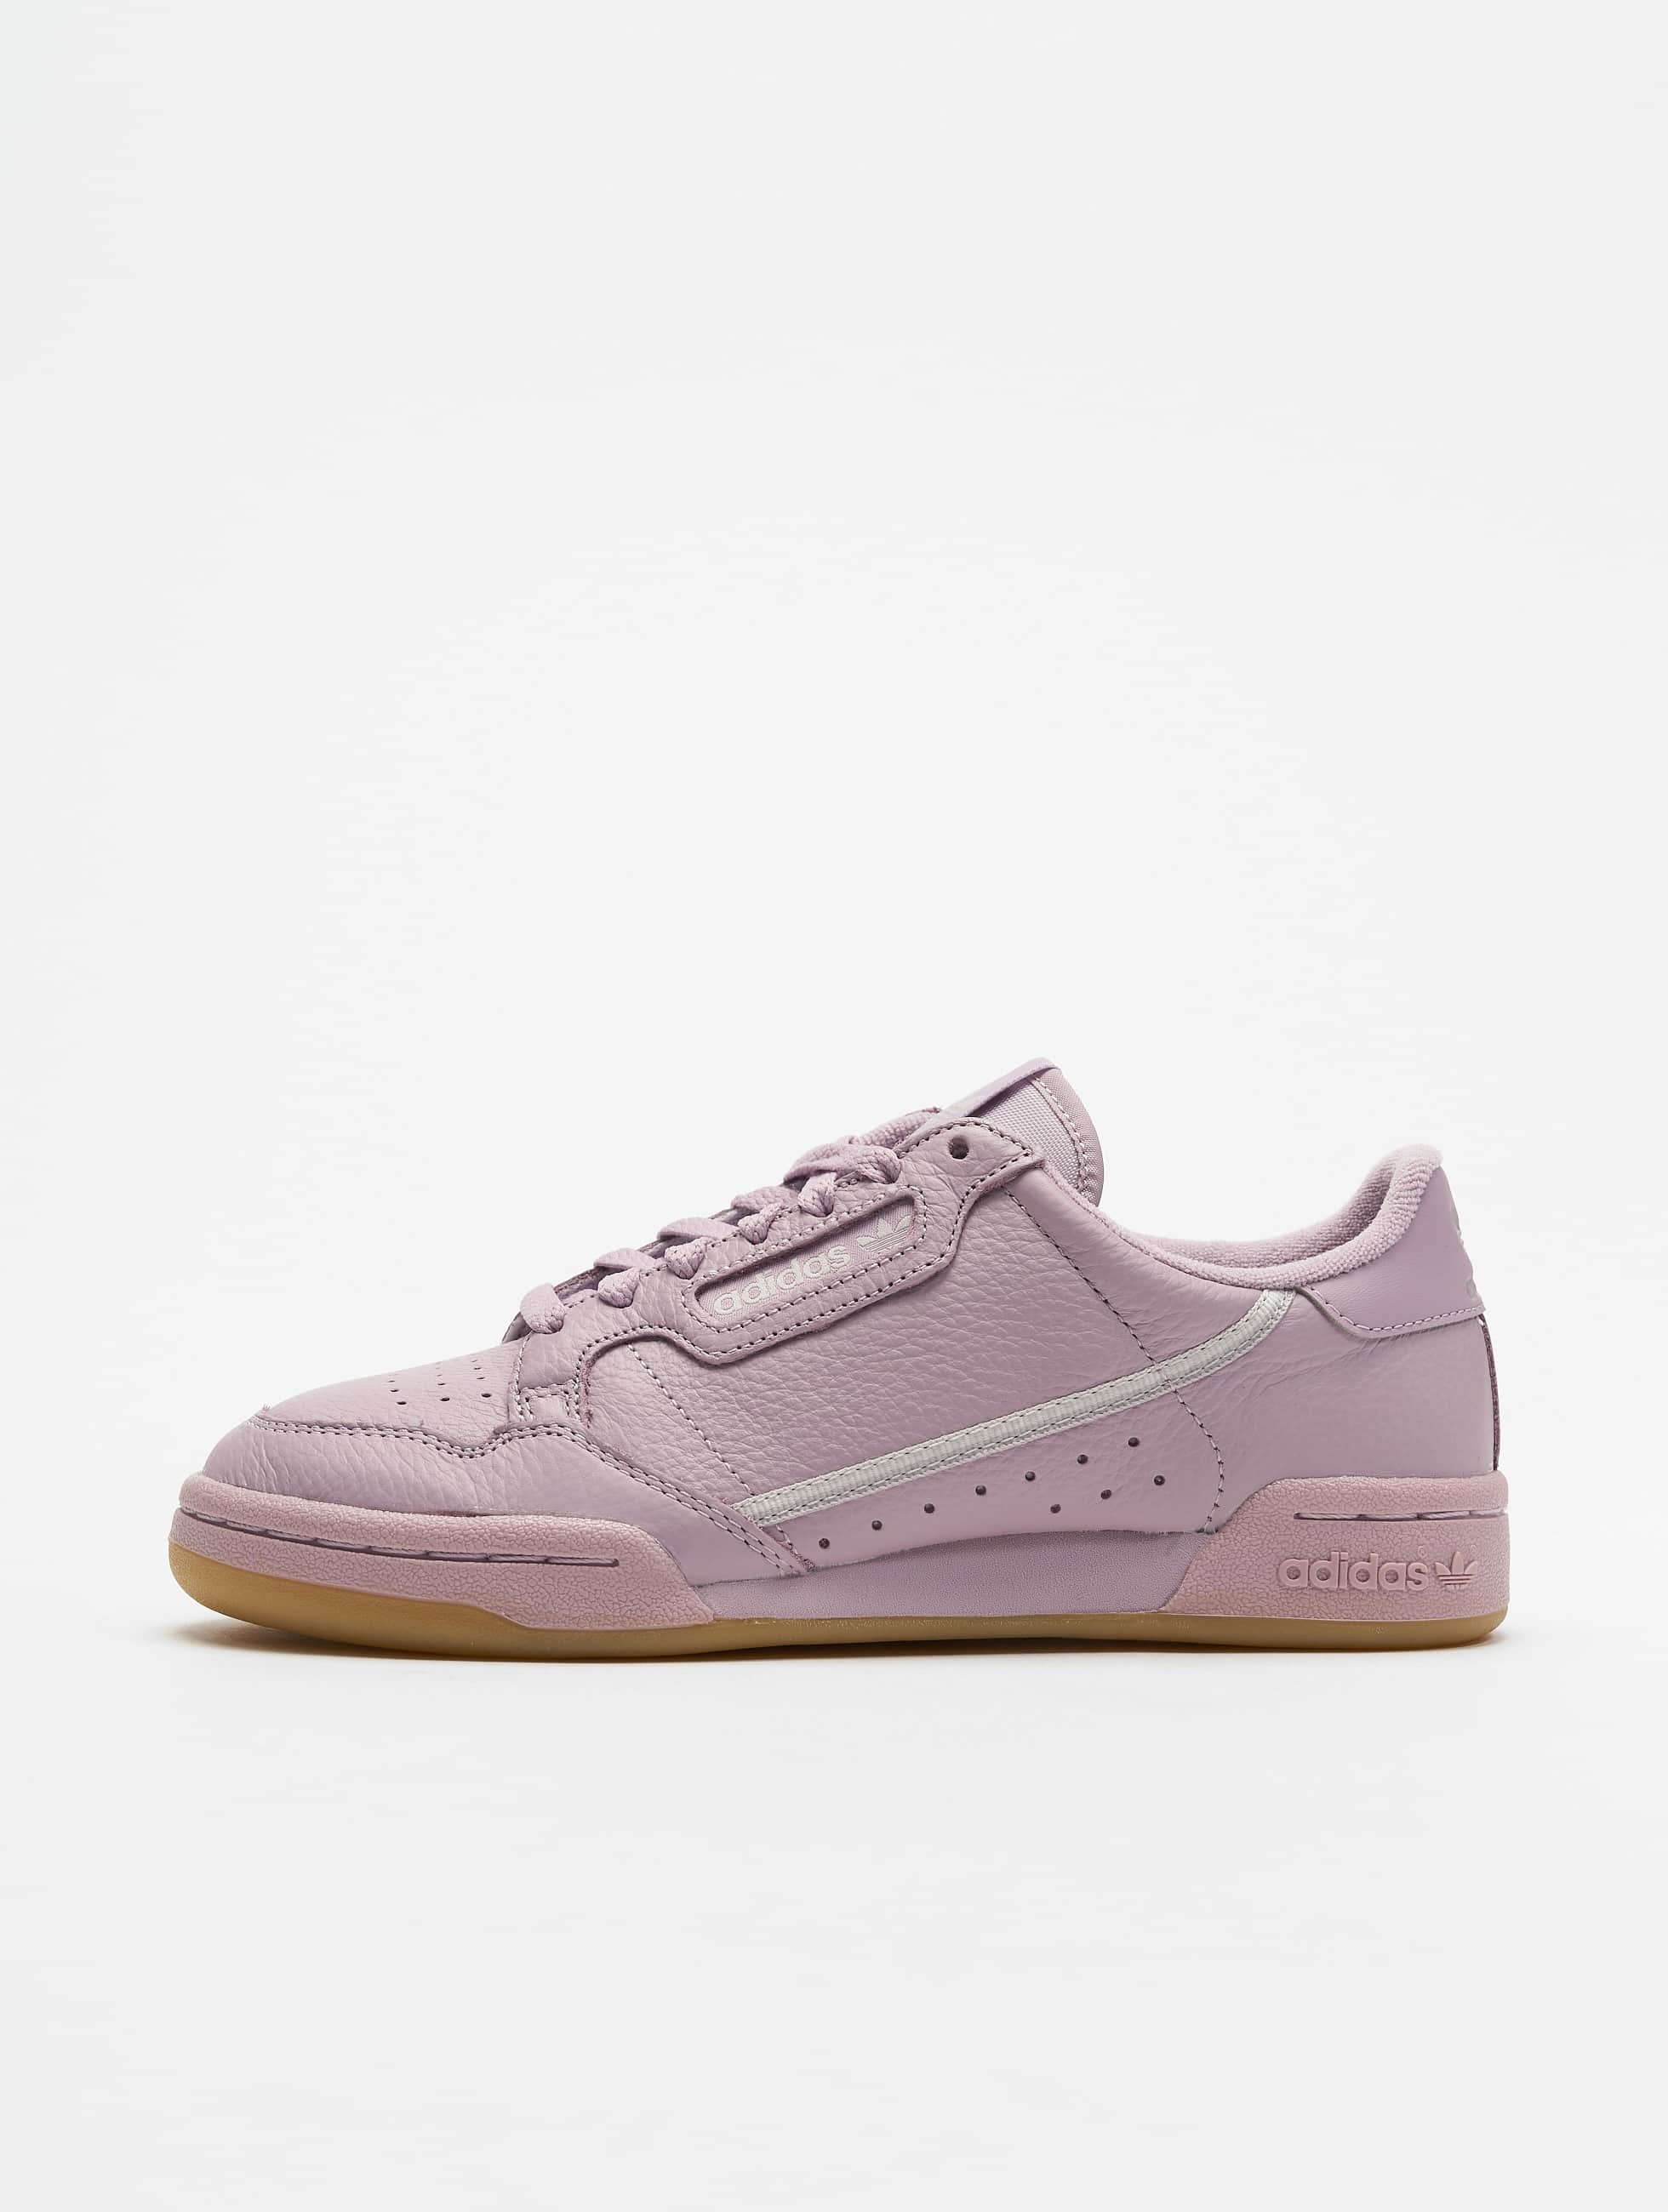 46bbf330db2 adidas originals schoen / sneaker Continental 80 W in paars 543084